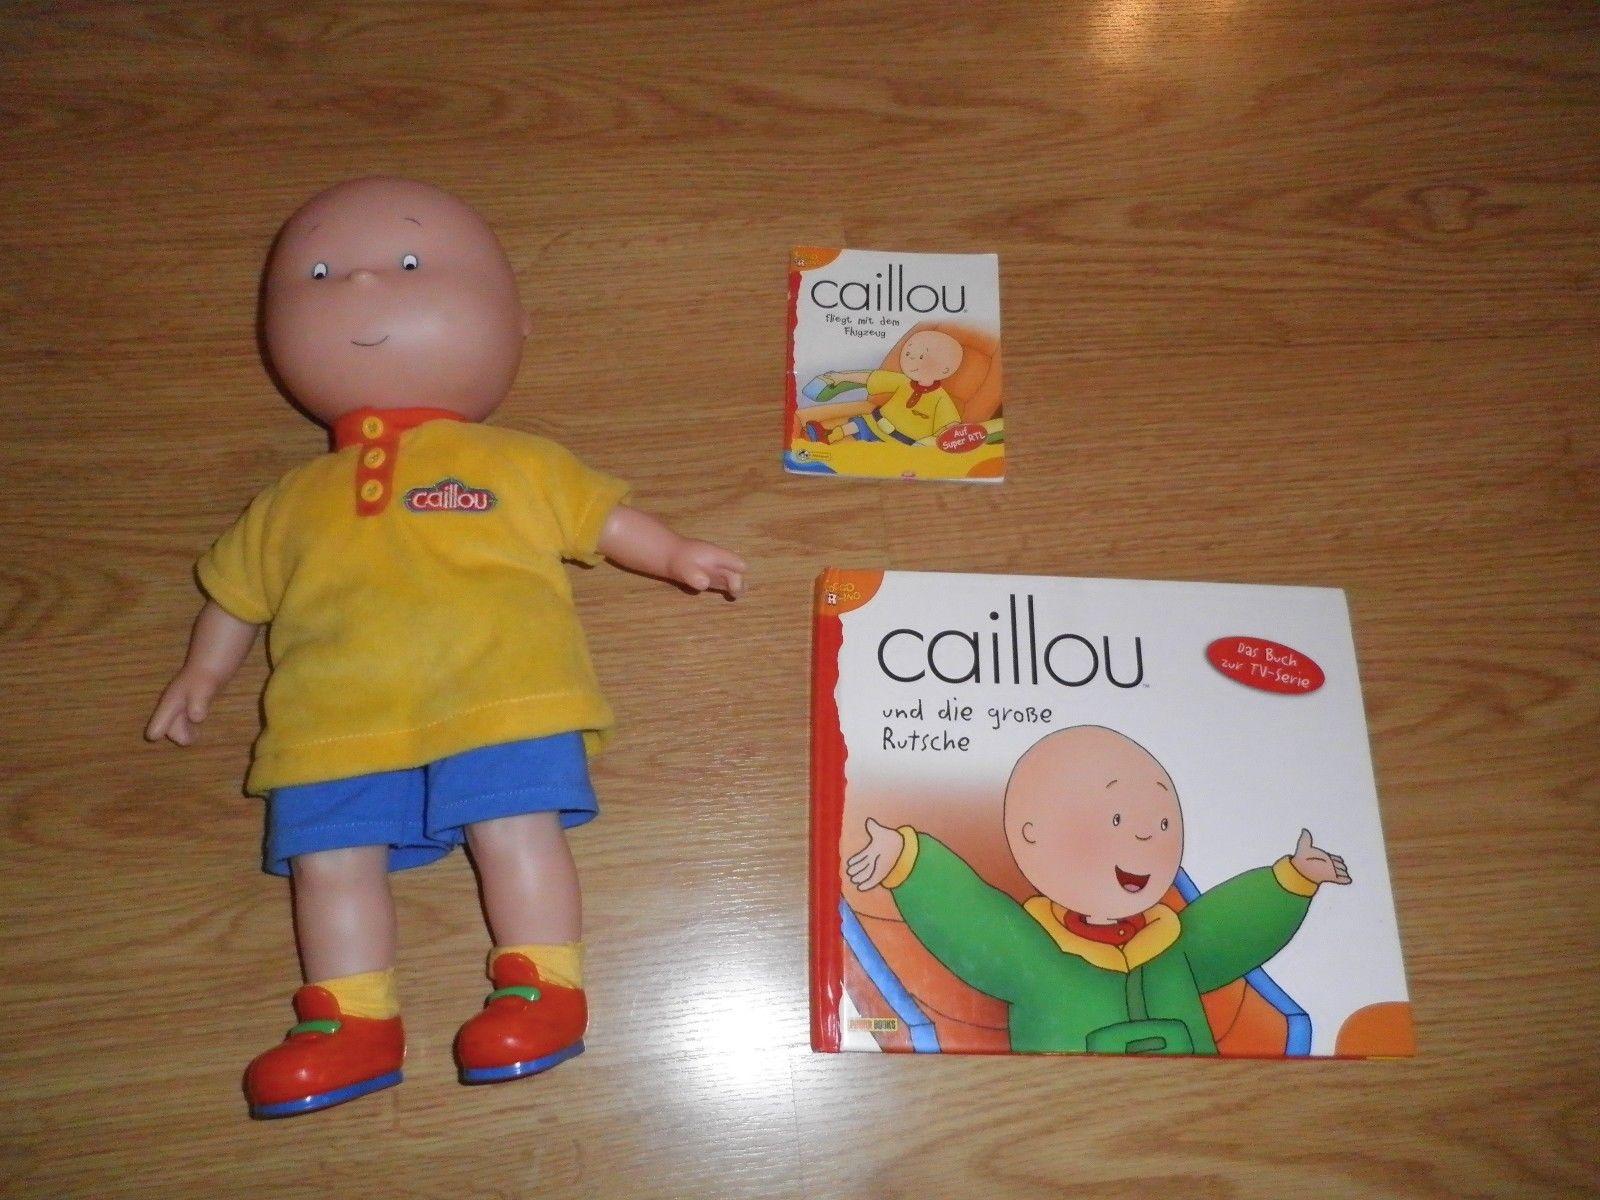 Caillou puppe, buch, sammlung paket, Caillou Figur